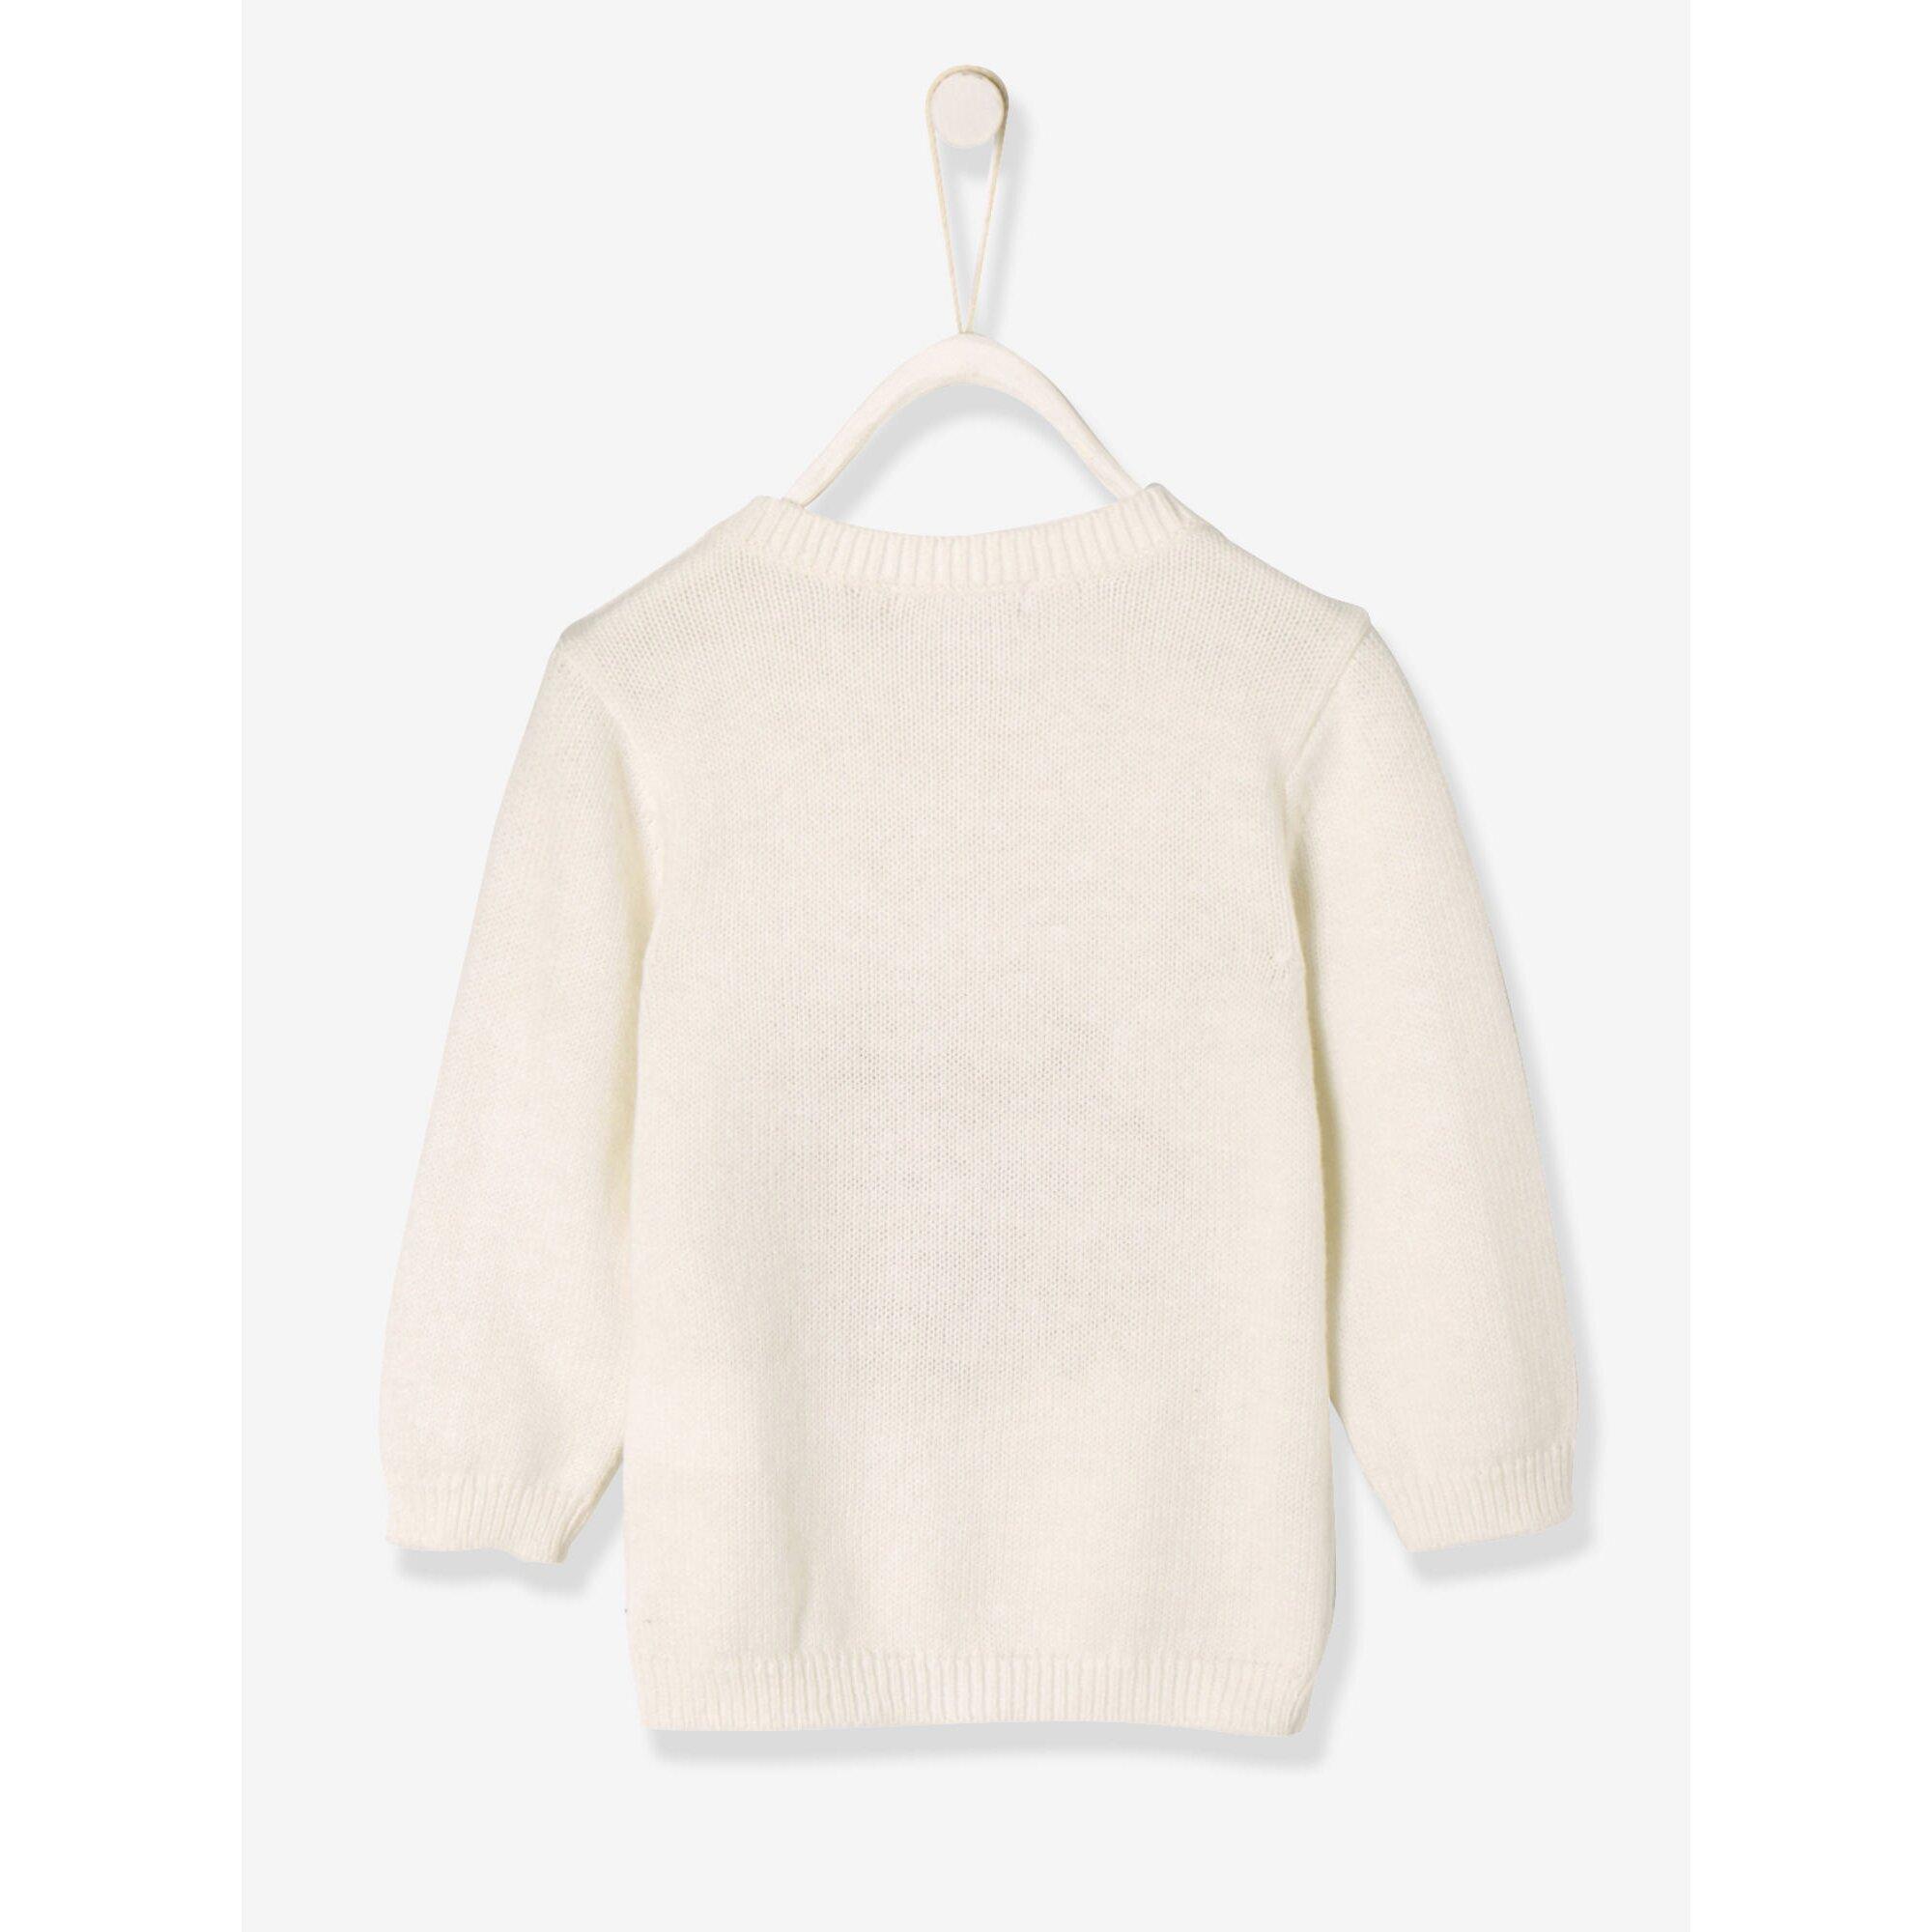 vertbaudet-pullover-baby-madchen, 18.99 EUR @ babywalz-de